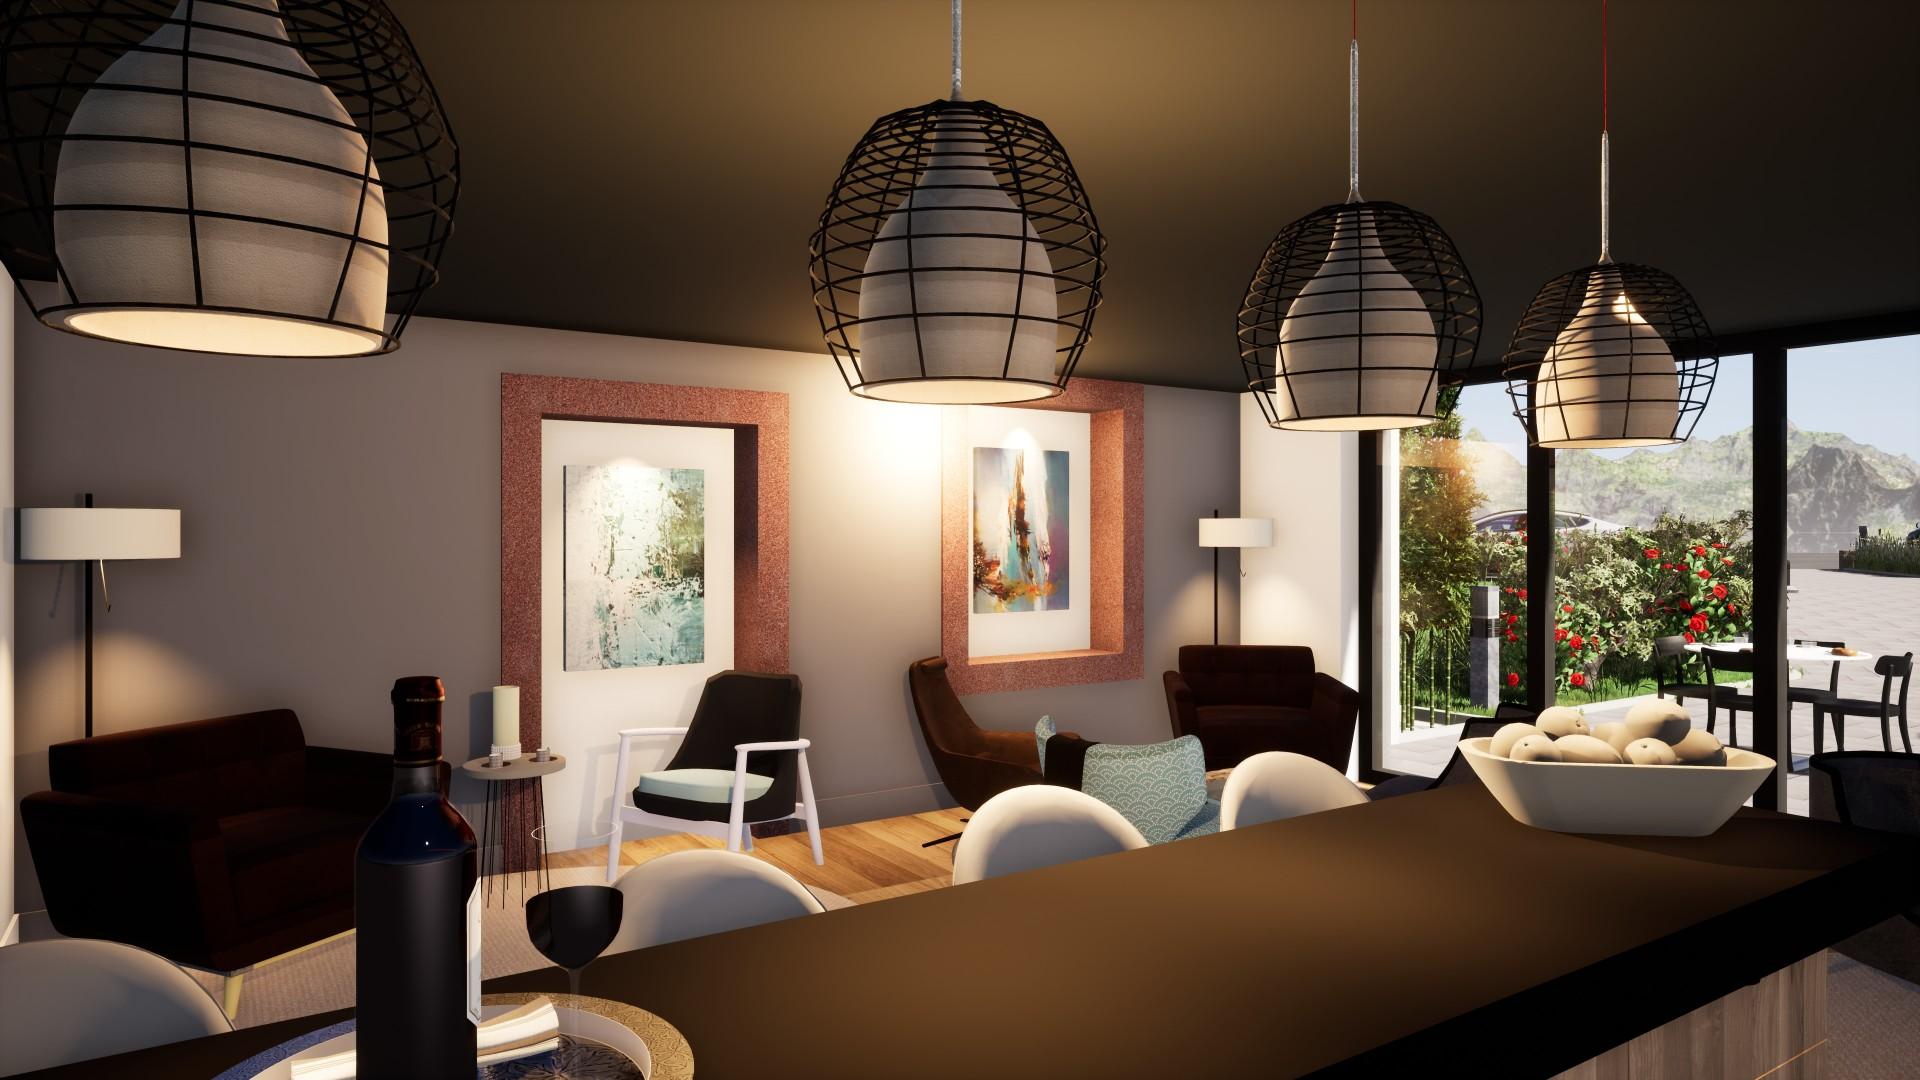 Programme immobilier Alsace